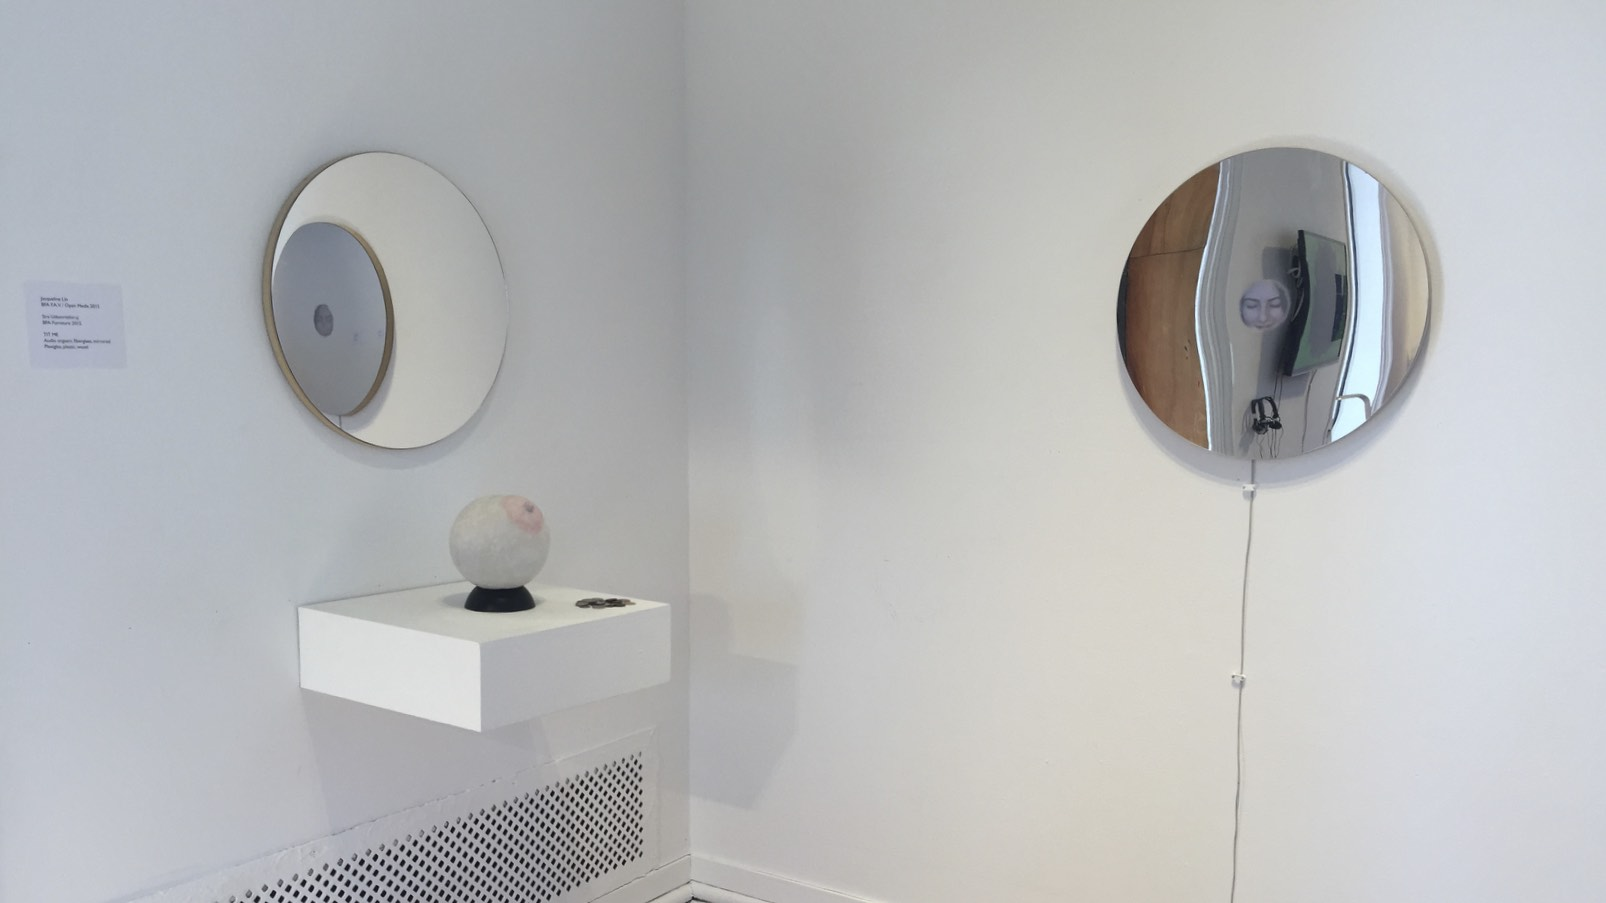 Tit Me    Fiberglass, Gouache, Mirrorred plexiglass, Sculpey, Soccerball coin bank, Video loop, Wood   April 2015